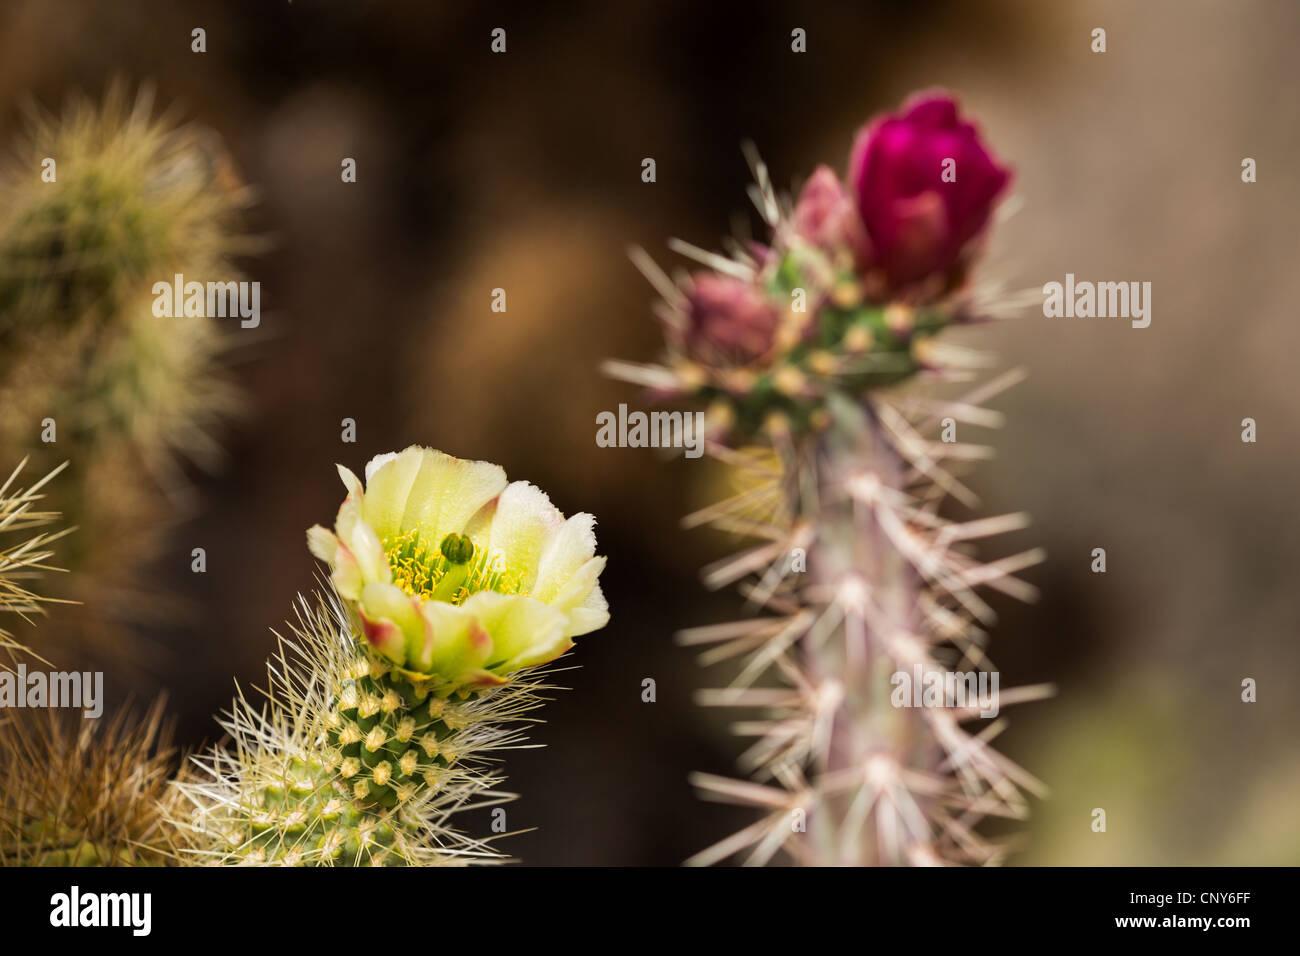 Macro photograph of a Buckhorn Cholla blossom and buds with a Teddy Bear Cholla blossom Stock Photo